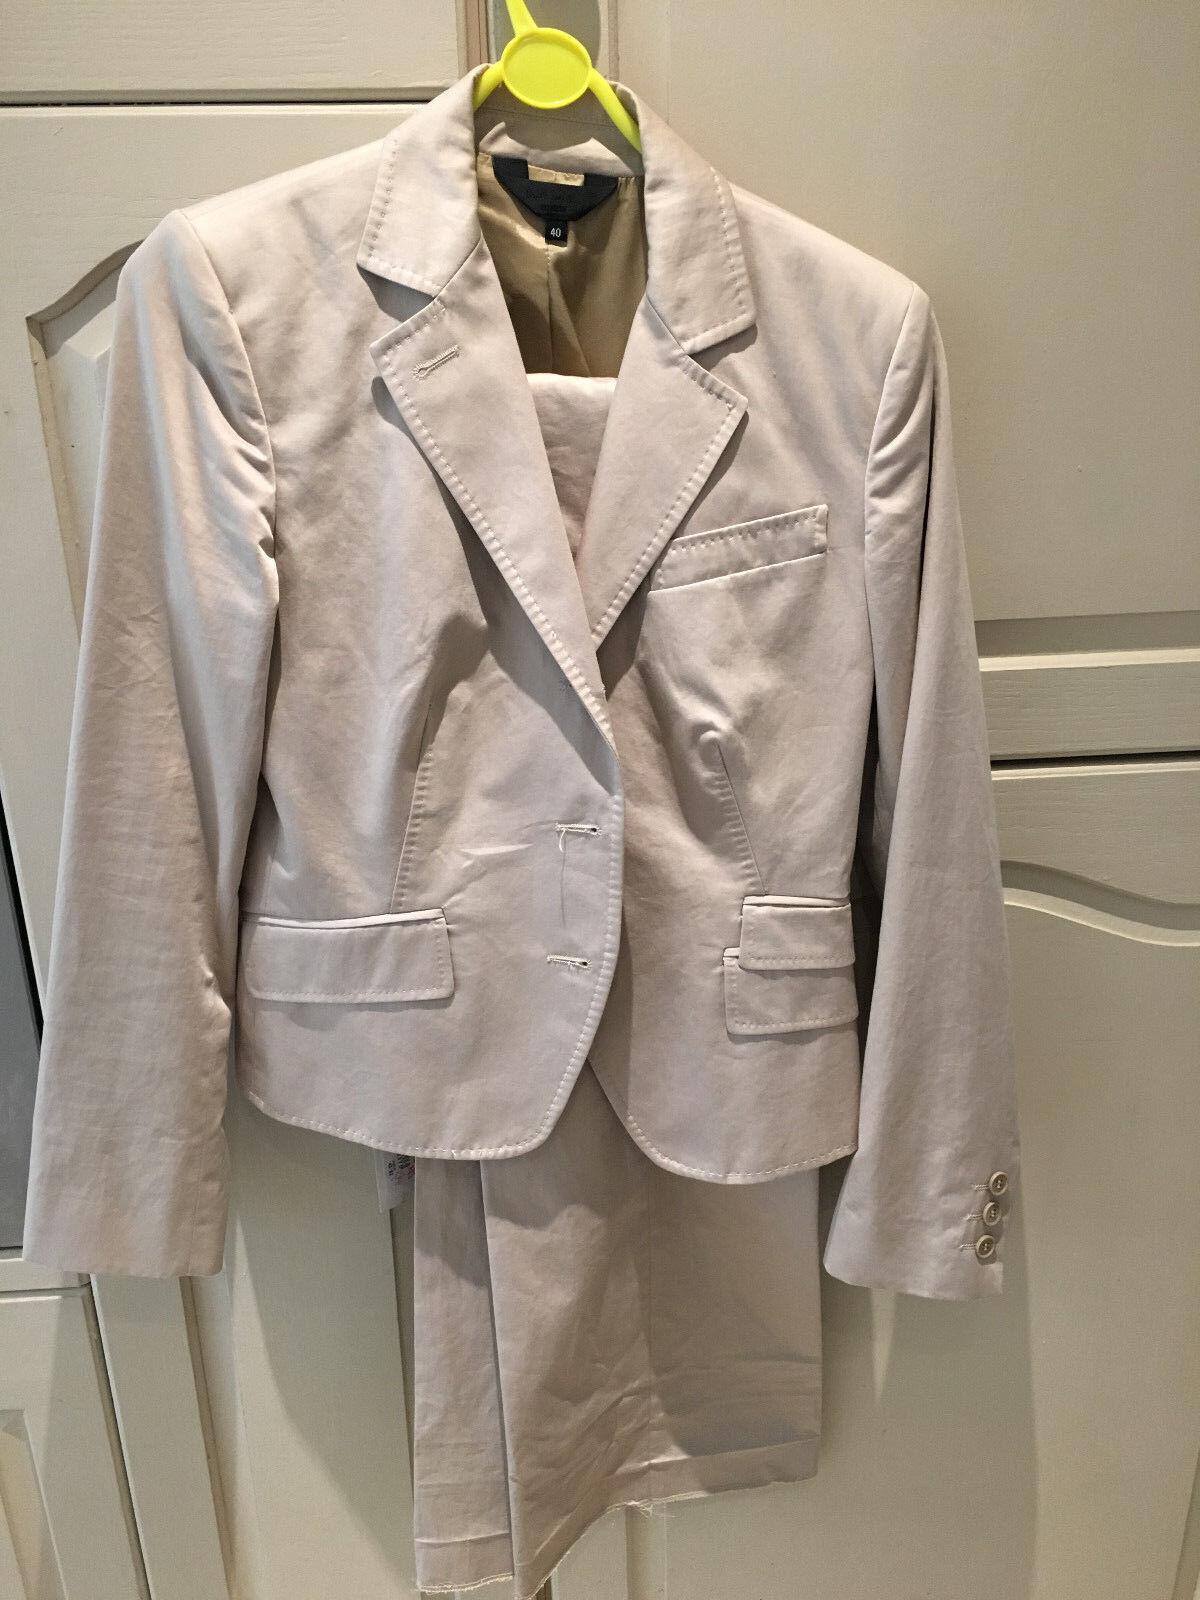 NUOVO Donna Paul Paul Paul Smith  GAMMA NERO  Beige Suit (Giacca e pantaloni) 6bdb65